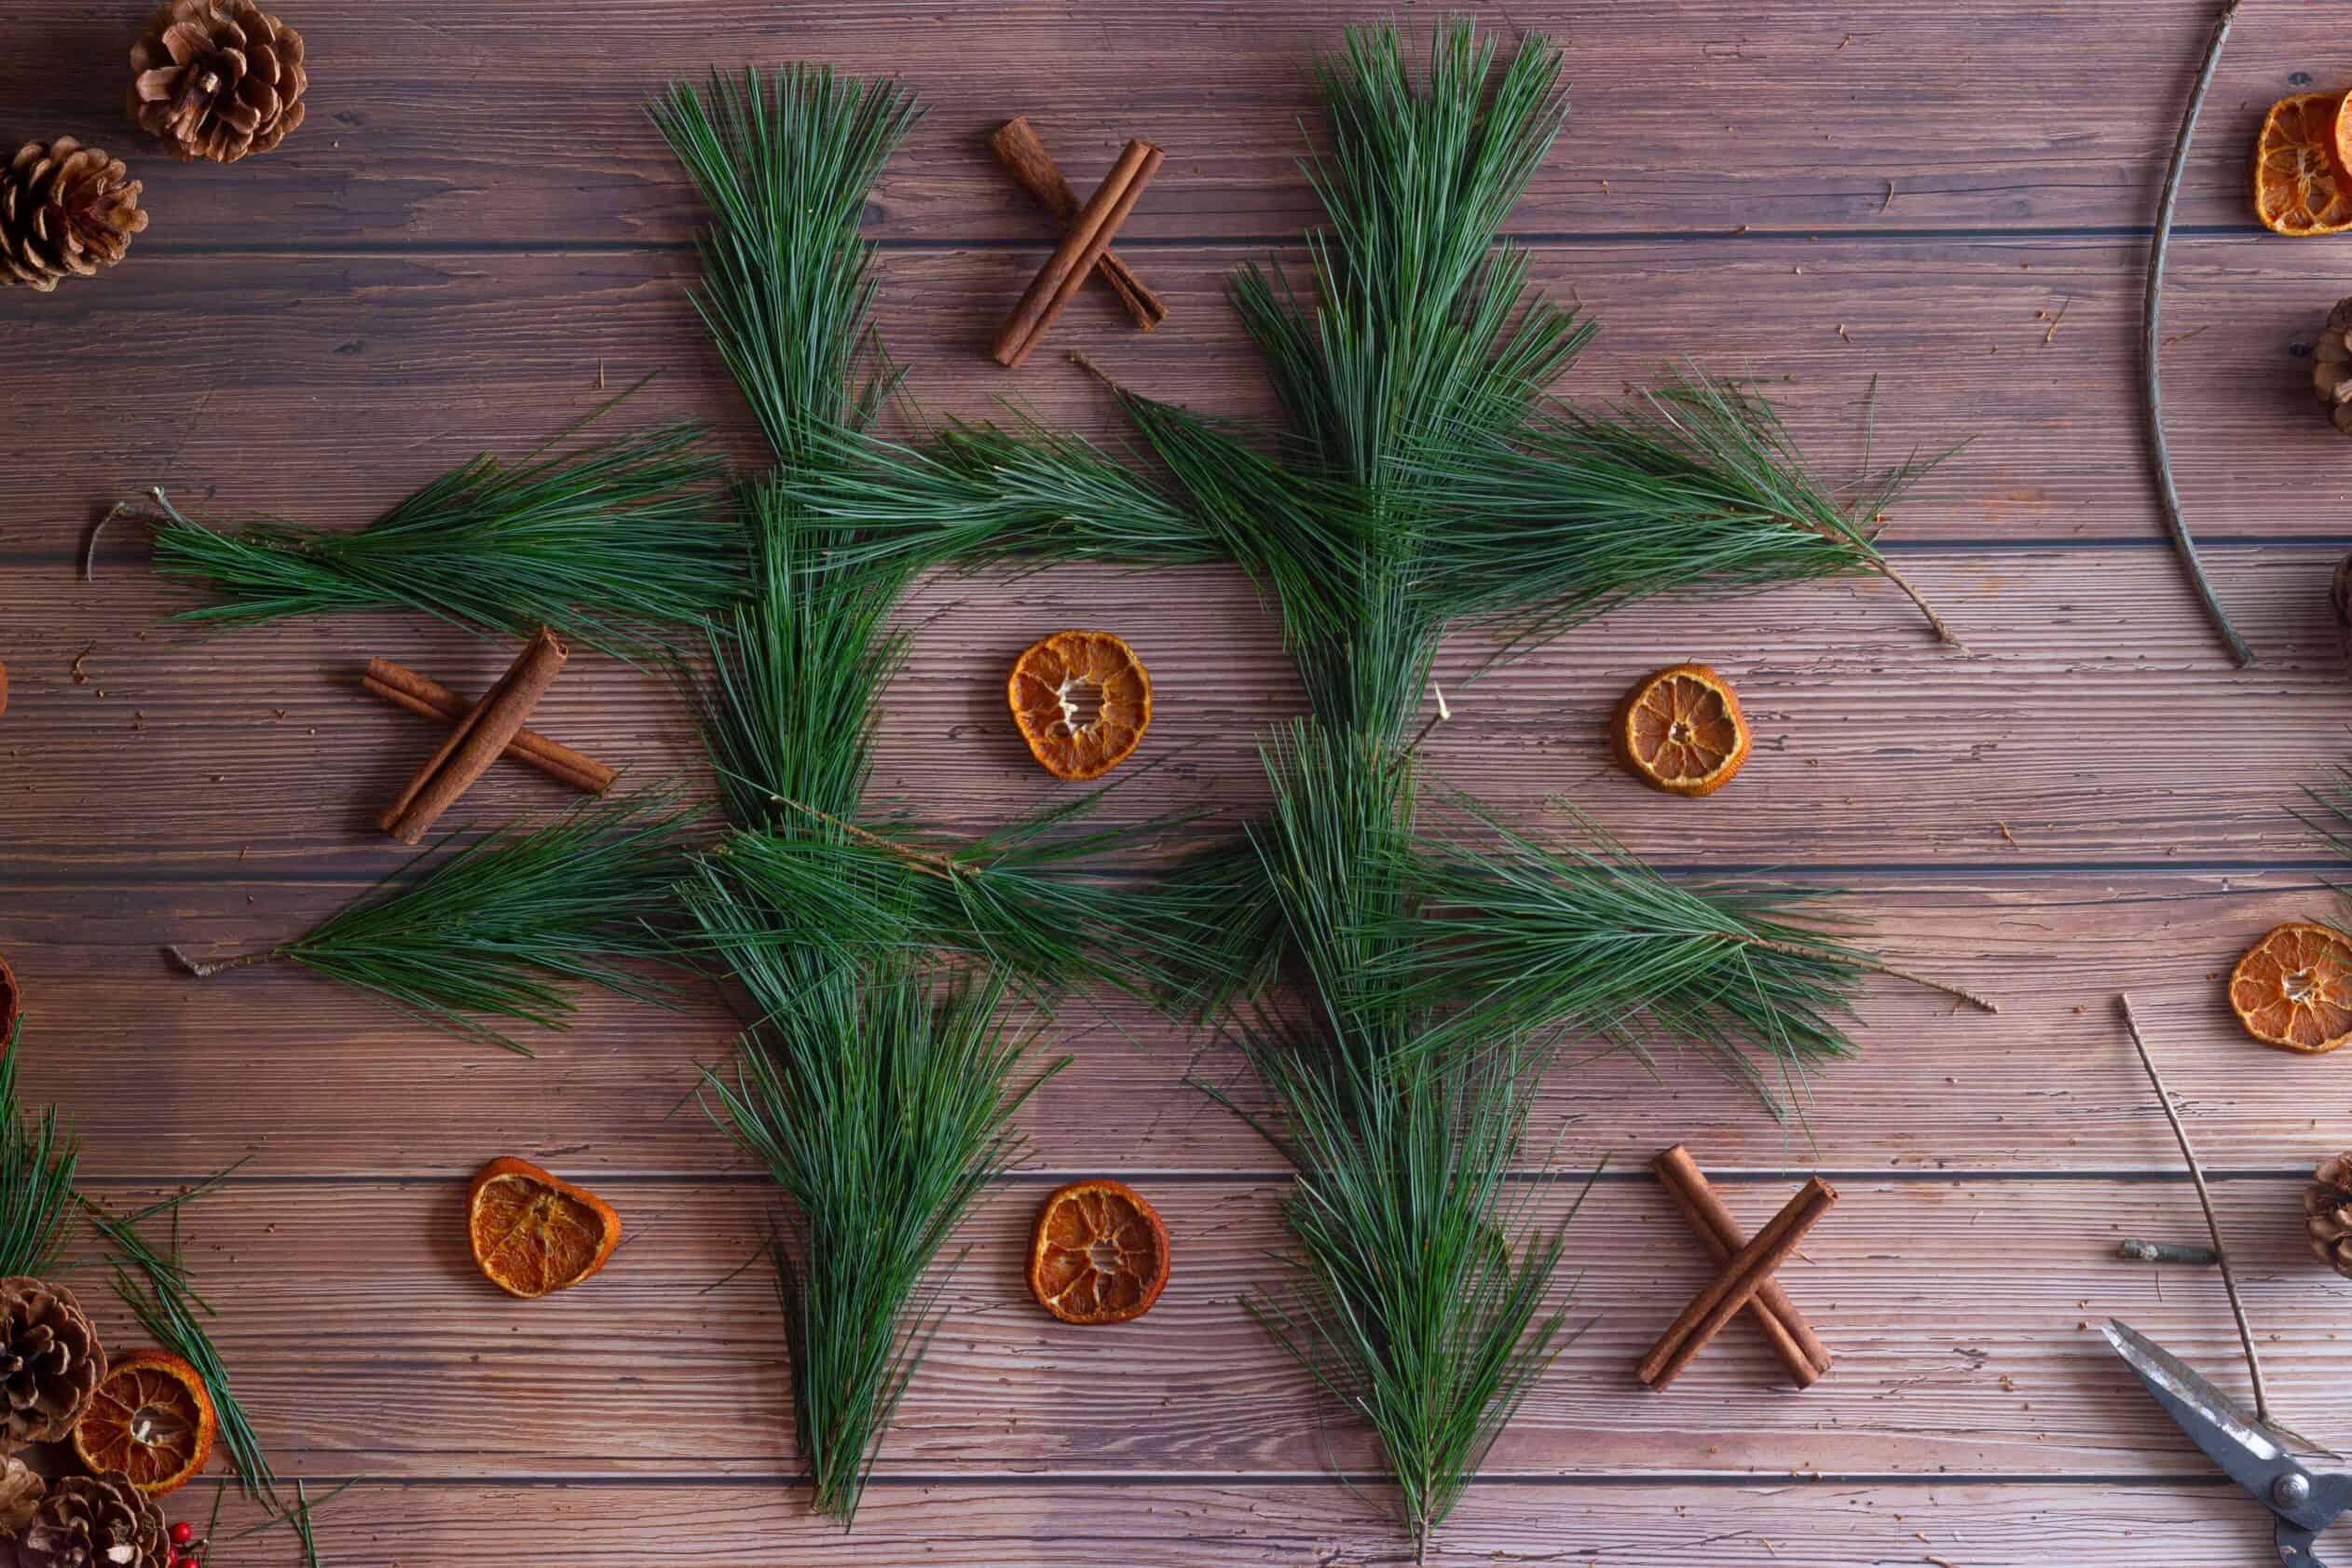 pine needles cinnamon and orange slices tic tac toe